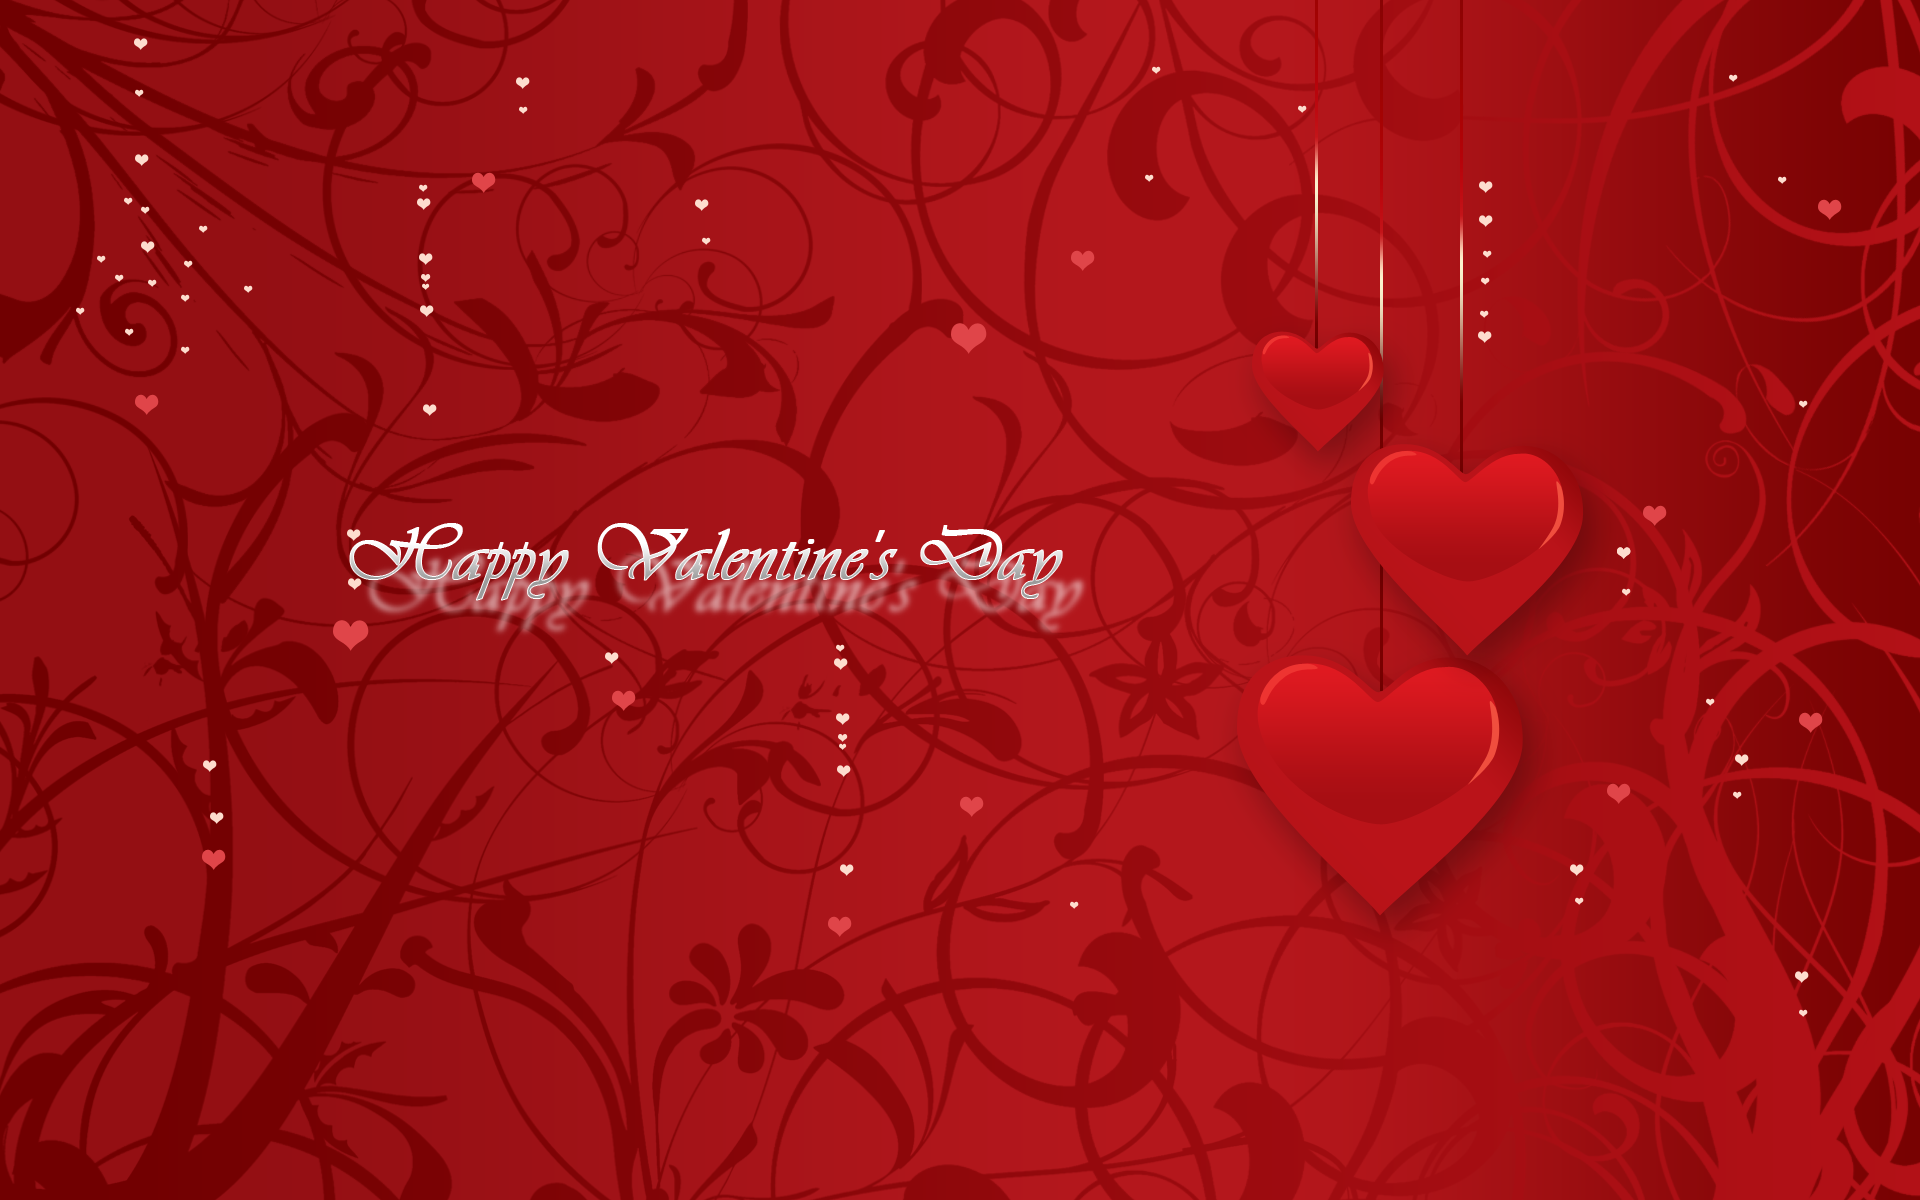 february desktop calendar wallpaper nocal wallpapers valentines 1920x1200